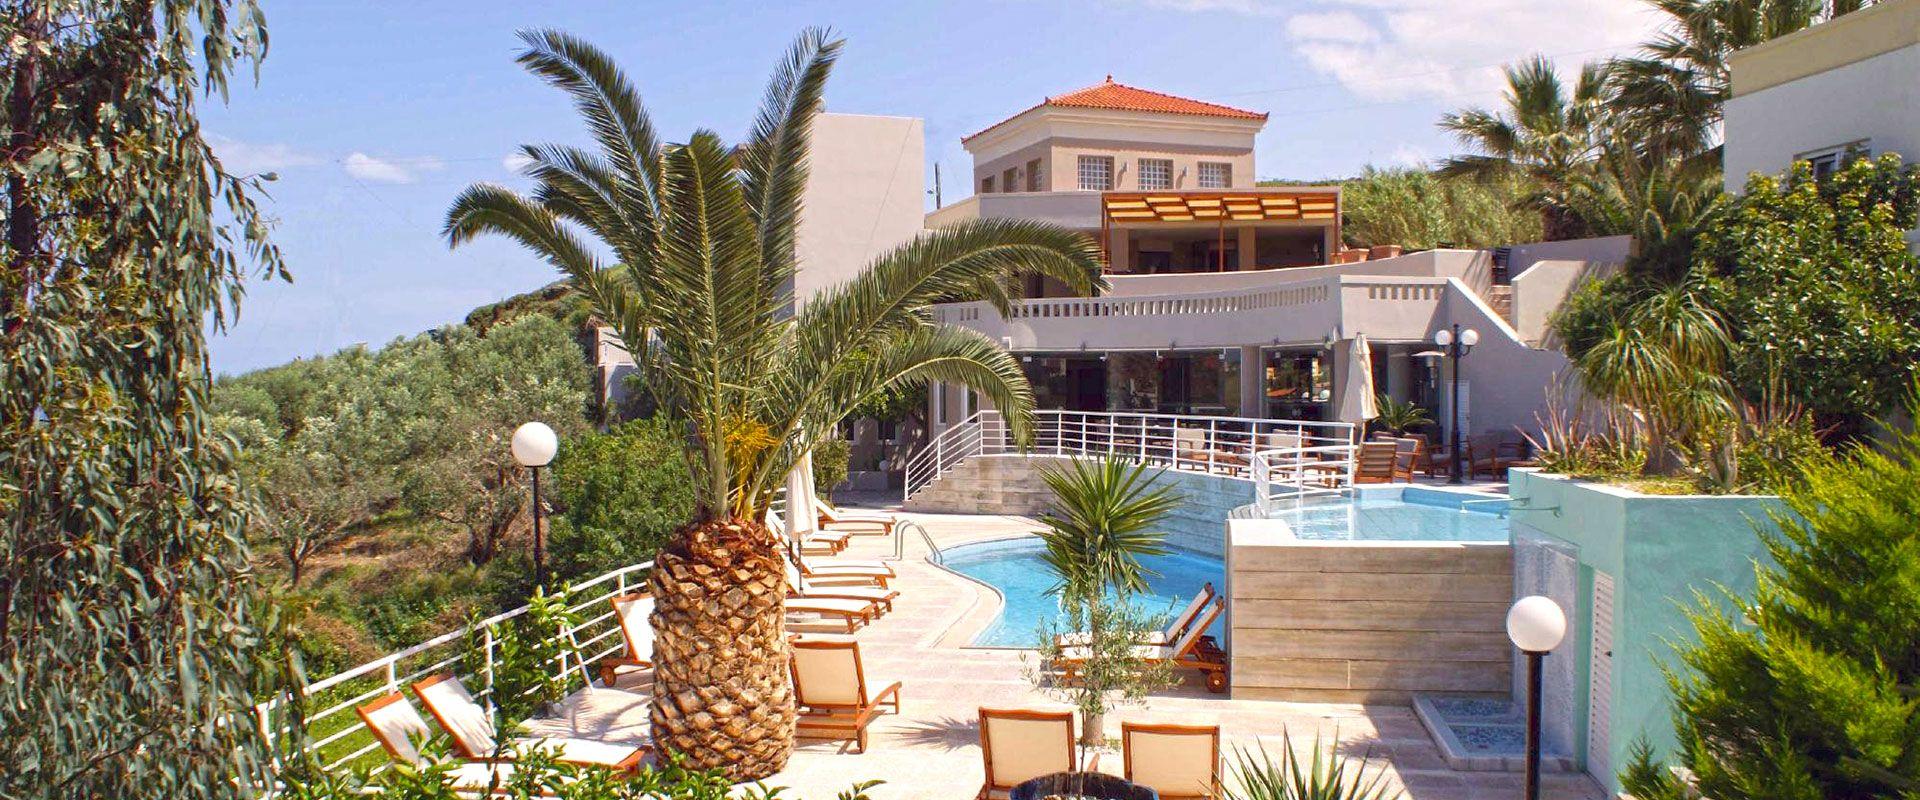 Pelagia Bay Hotel - Κρήτη, Ηράκλειο ✦ 2 Ημέρες (1 Διανυκτέρευση) ✦ 2 άτομα ✦ Χωρίς Πρωινό ✦ 12/09/2020 έως 30/09/2020 ✦ Free WiFi!